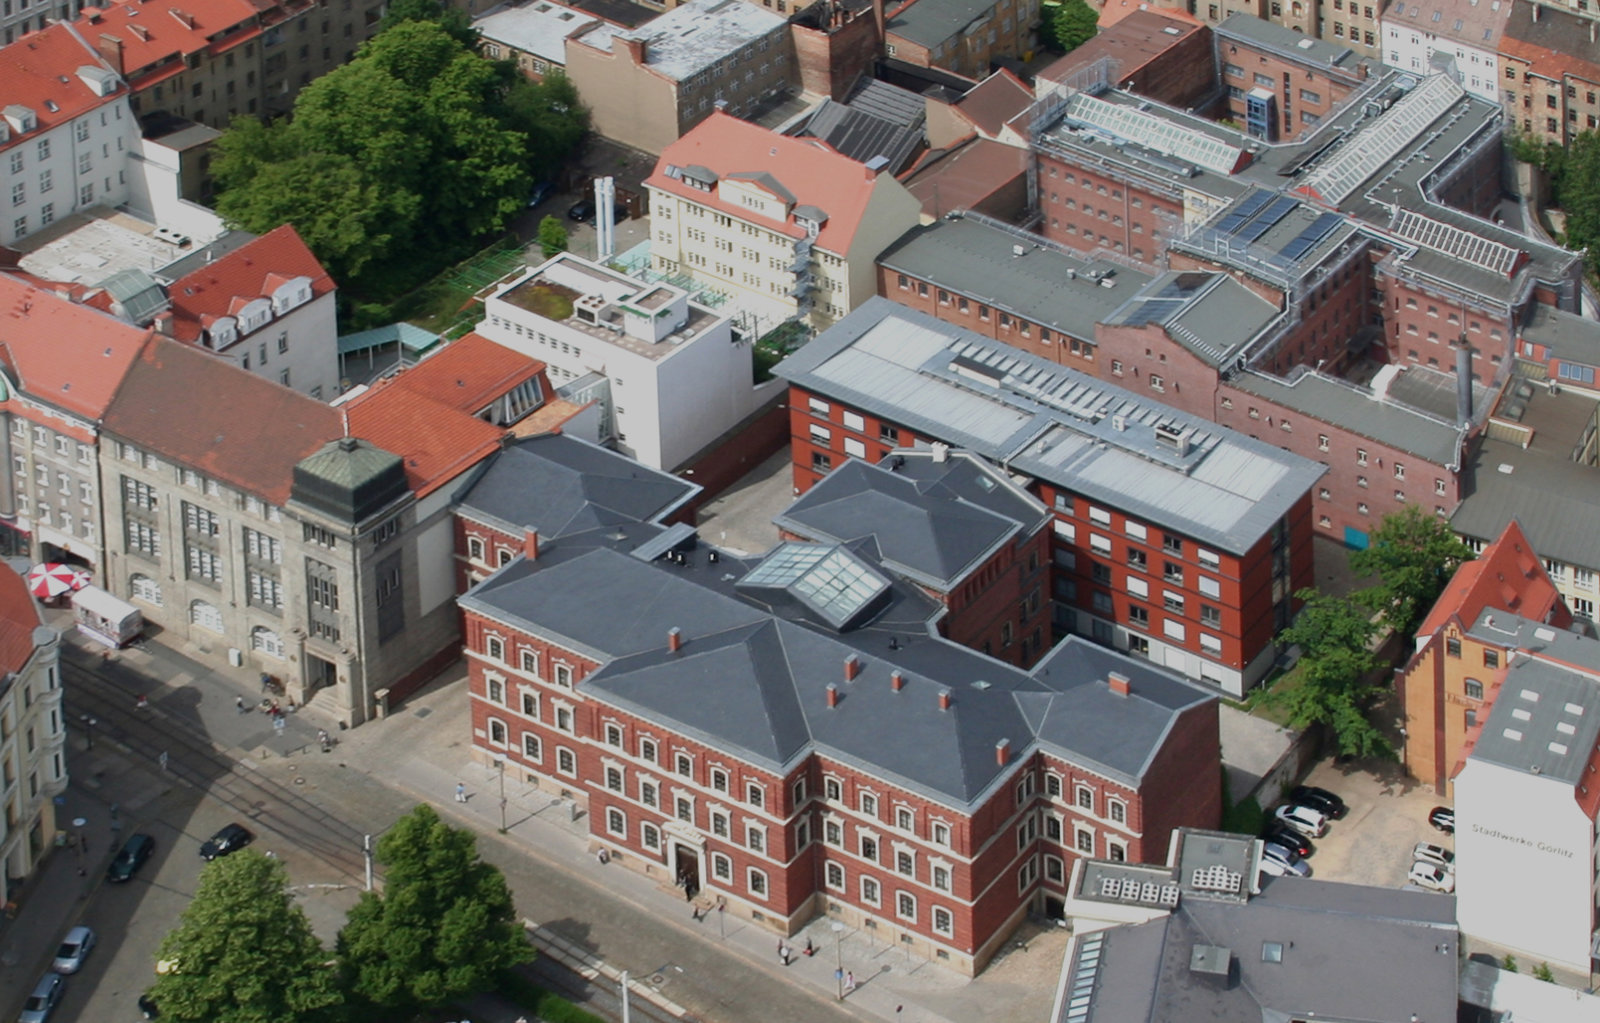 Gericht & JVA Görlitz